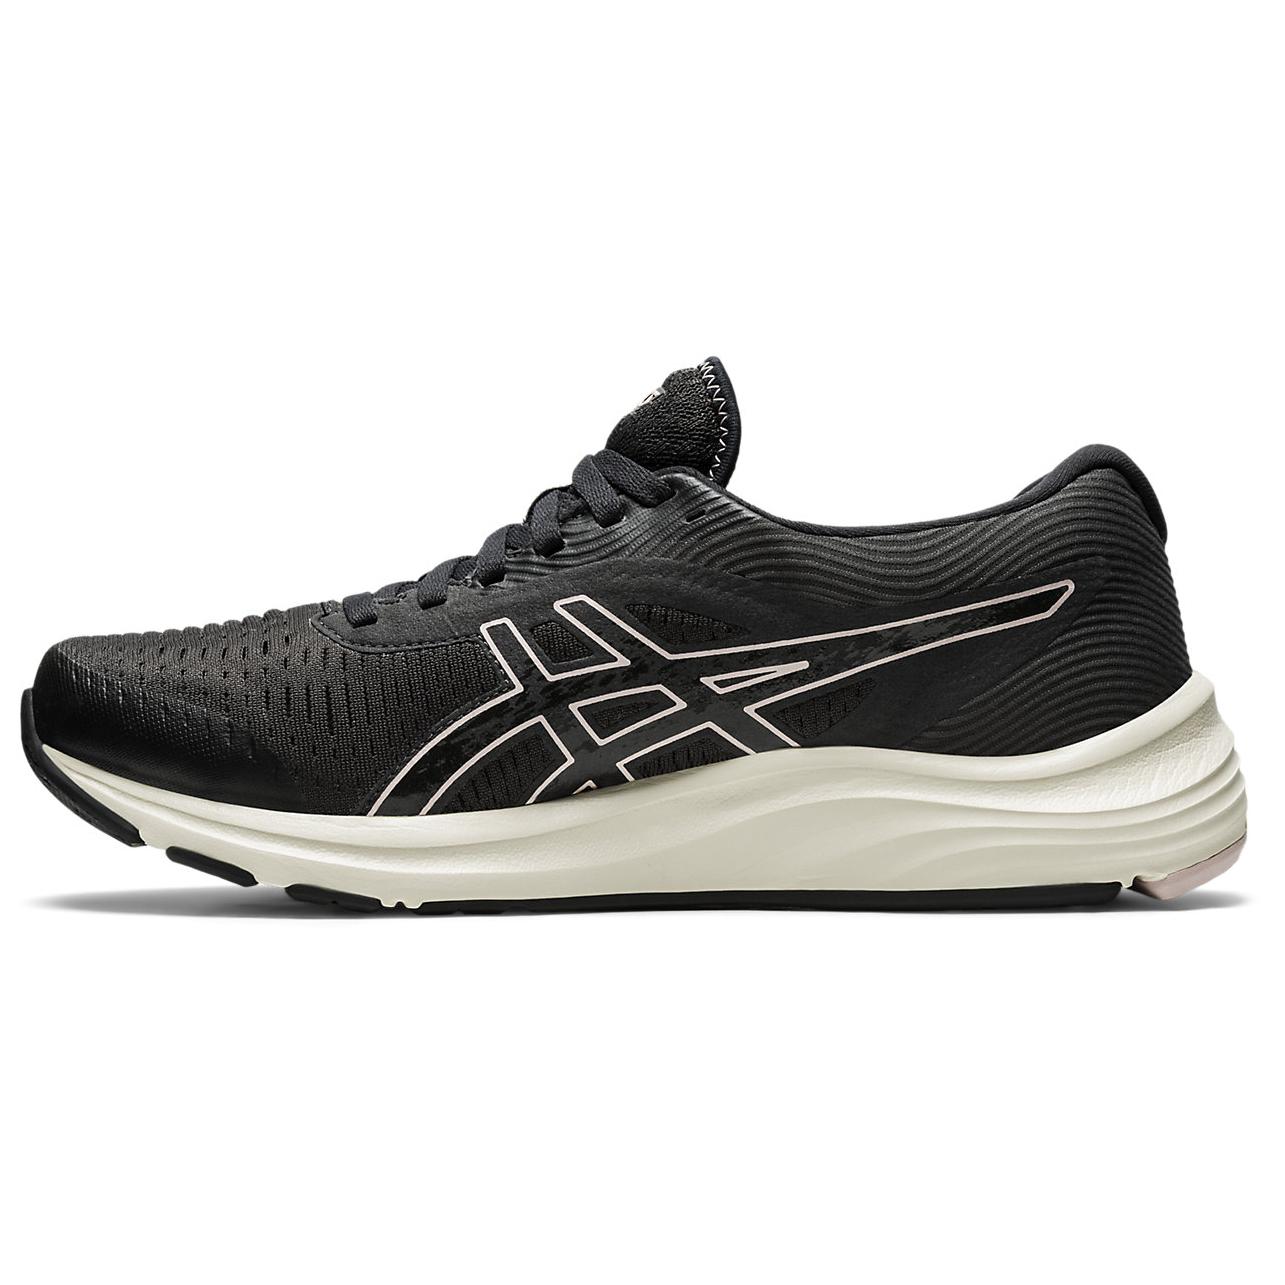 Asics - Women's Gel-Pulse 12 GTX - Running shoes - Graphite Grey / Graphite Grey   5,5 (US)